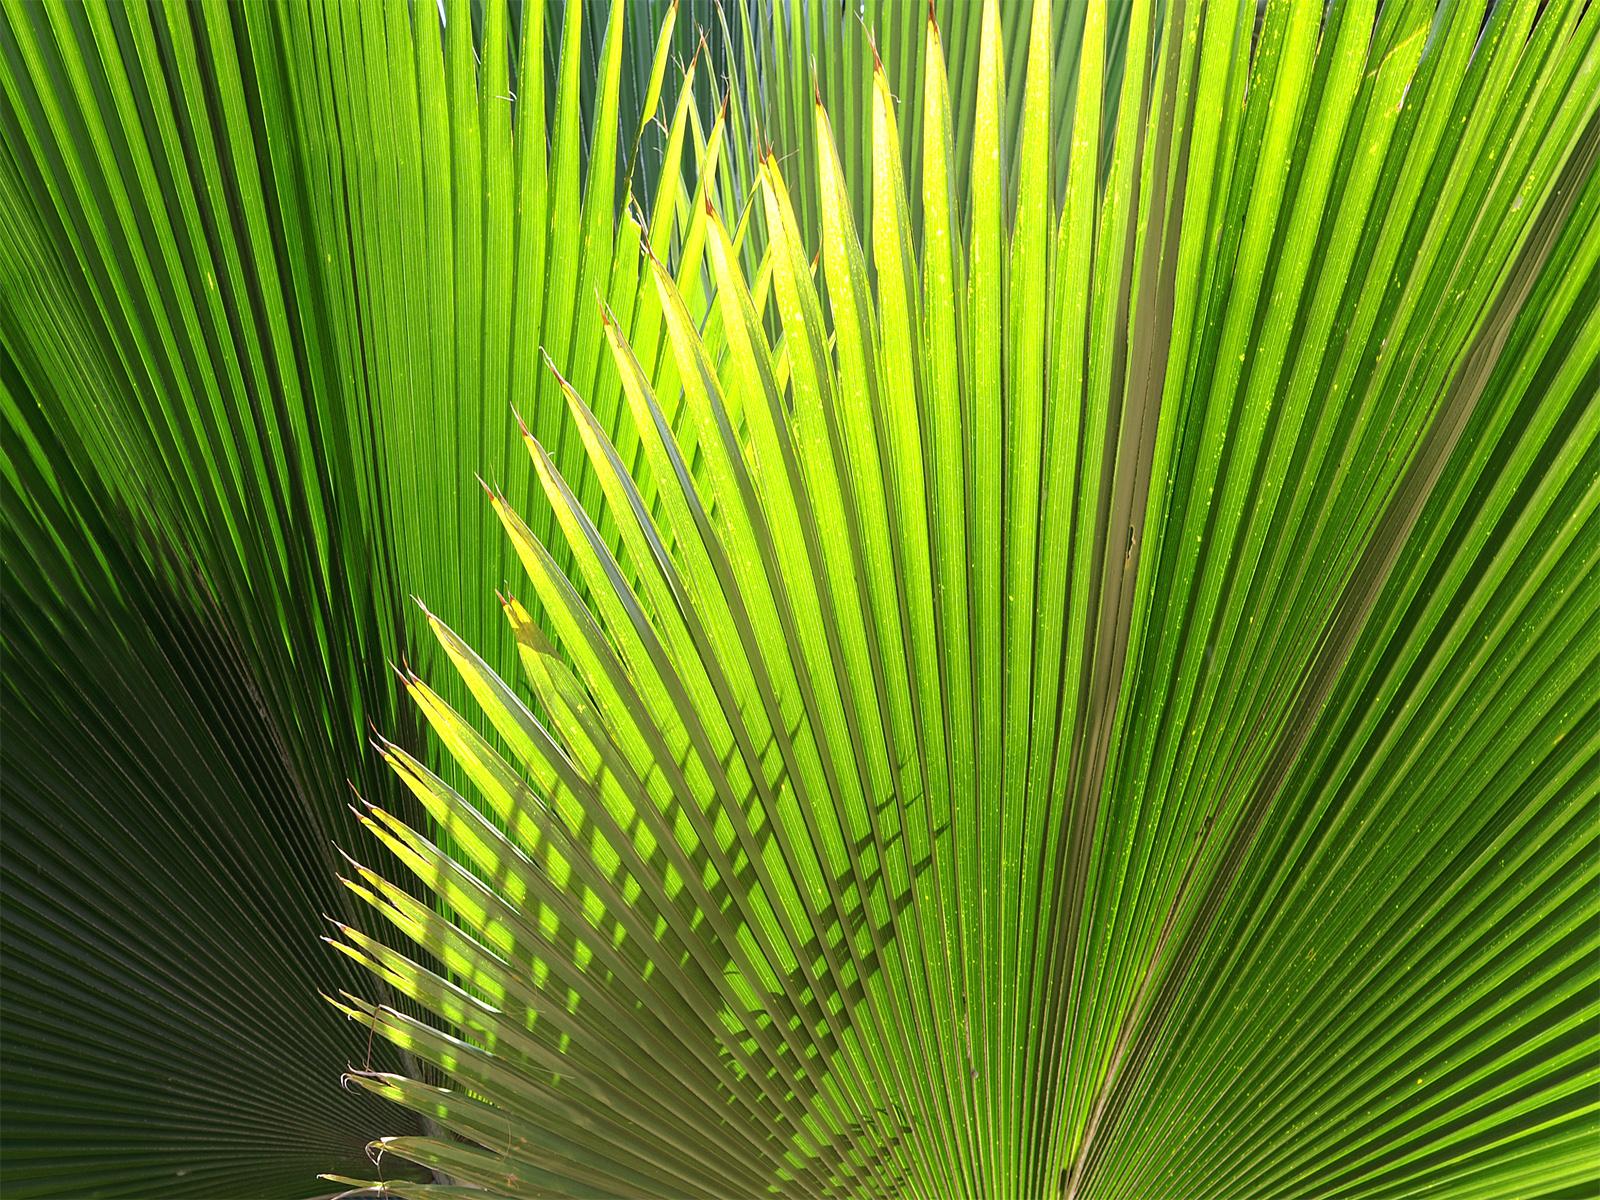 Green Plants In Farm Desktop Wallpapers - 7 Real Time Wallpapers ...